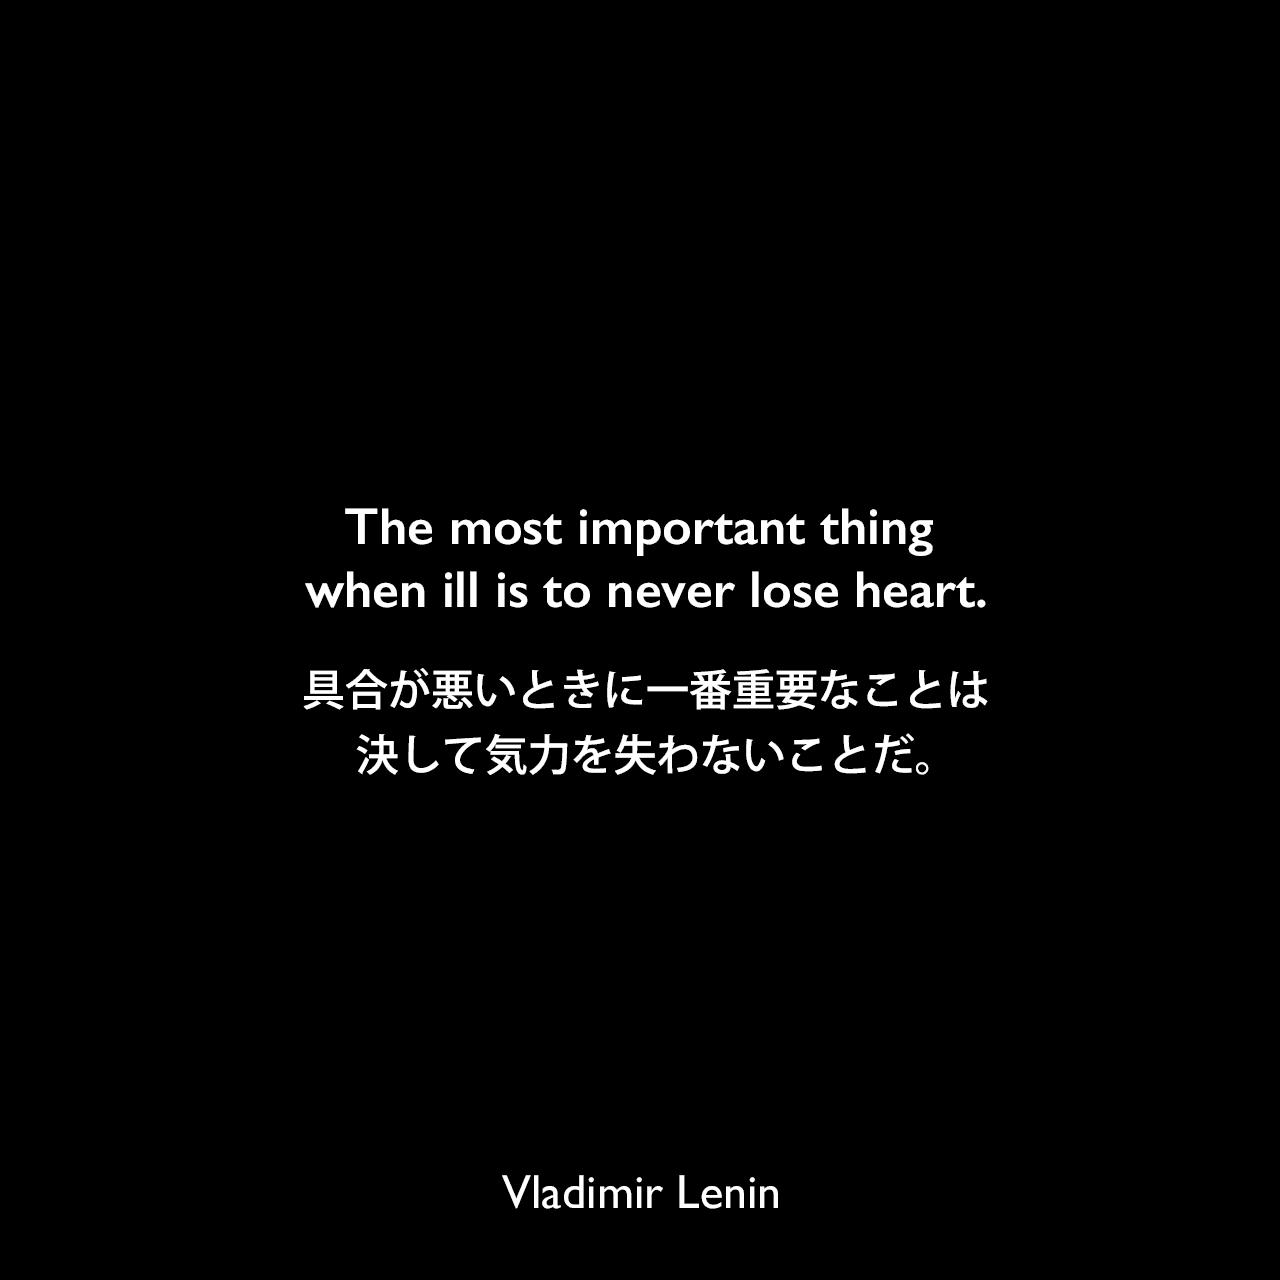 The most important thing when ill is to never lose heart.具合が悪いときに一番重要なことは、決して気力を失わないことだ。Vladimir Lenin